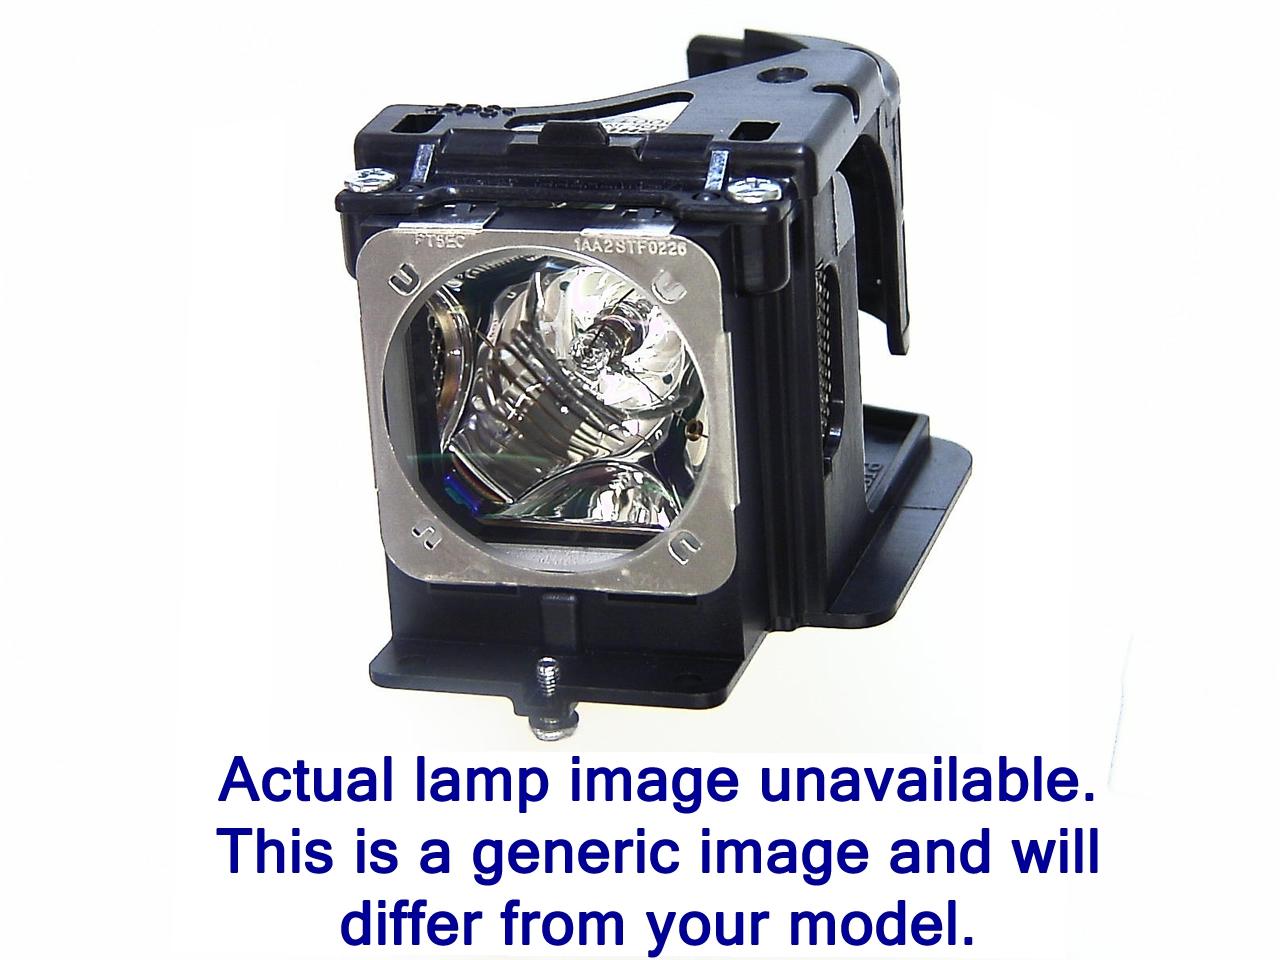 Smart Lámpara For CANON LV-5210 Proyector.